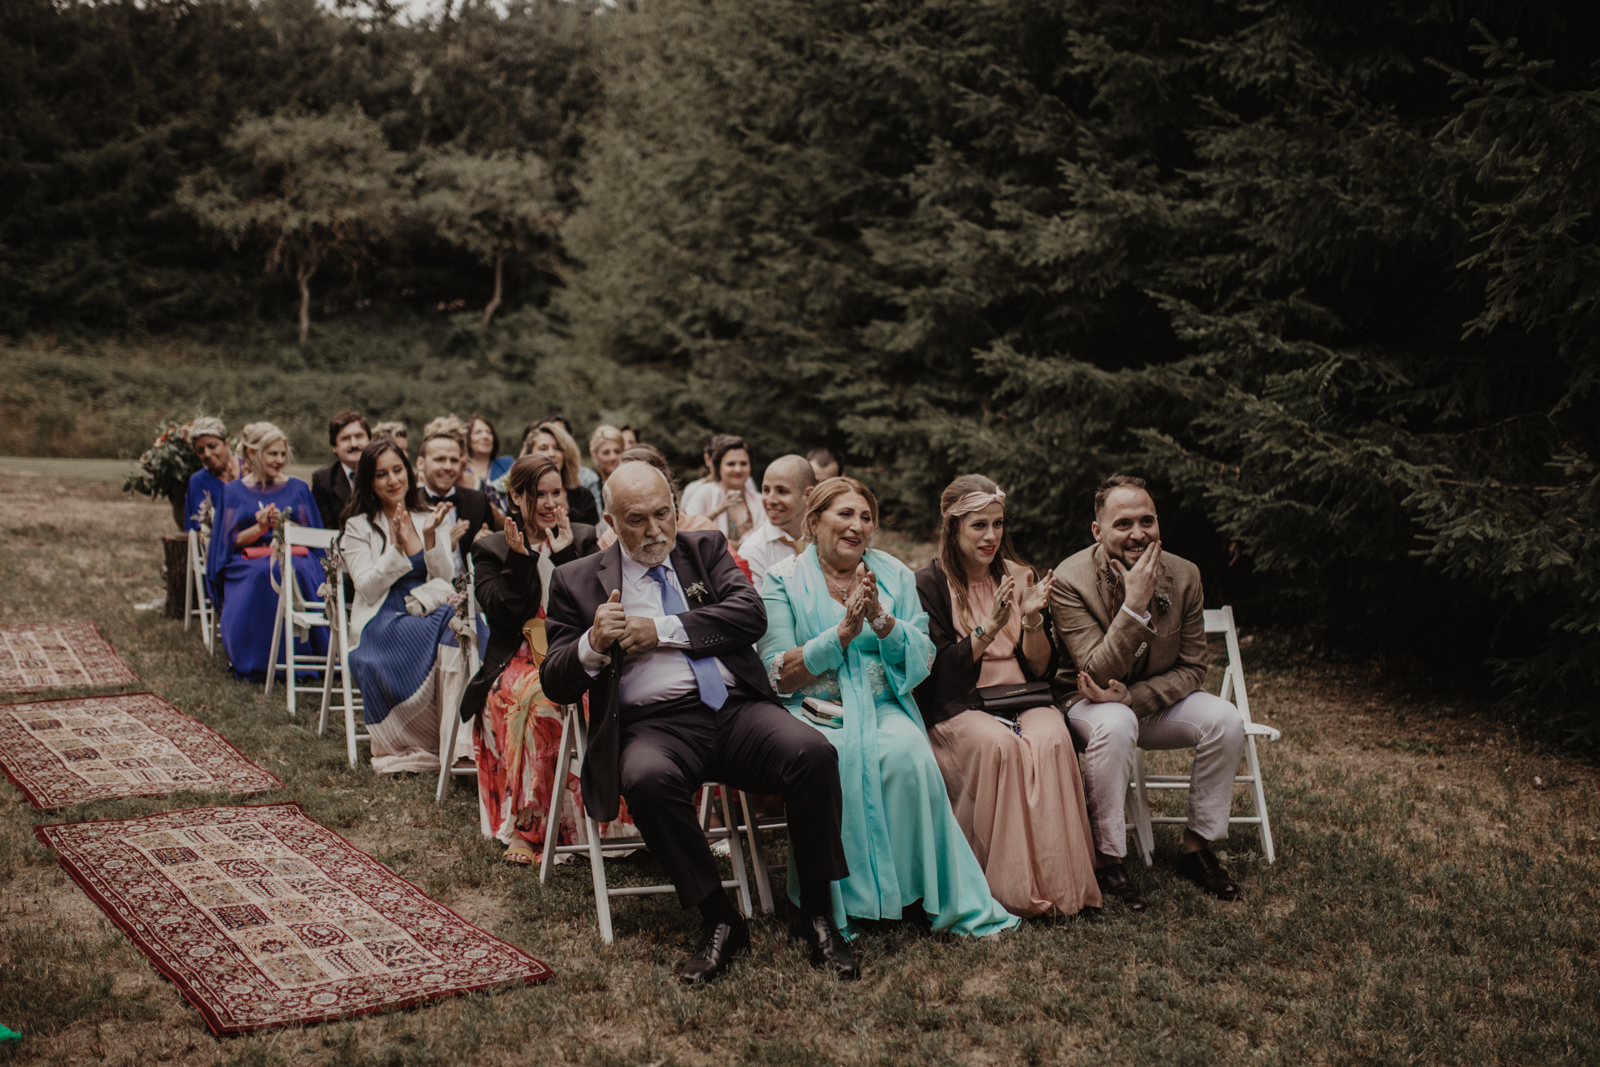 thenortherngirlphotography_photography_thenortherngirl_rebeccascabros_wedding_weddingphotography_weddingphotographer_barcelona_bodaenbarcelona_bodaenmaselmarti_bodarogeryvane-460.jpg